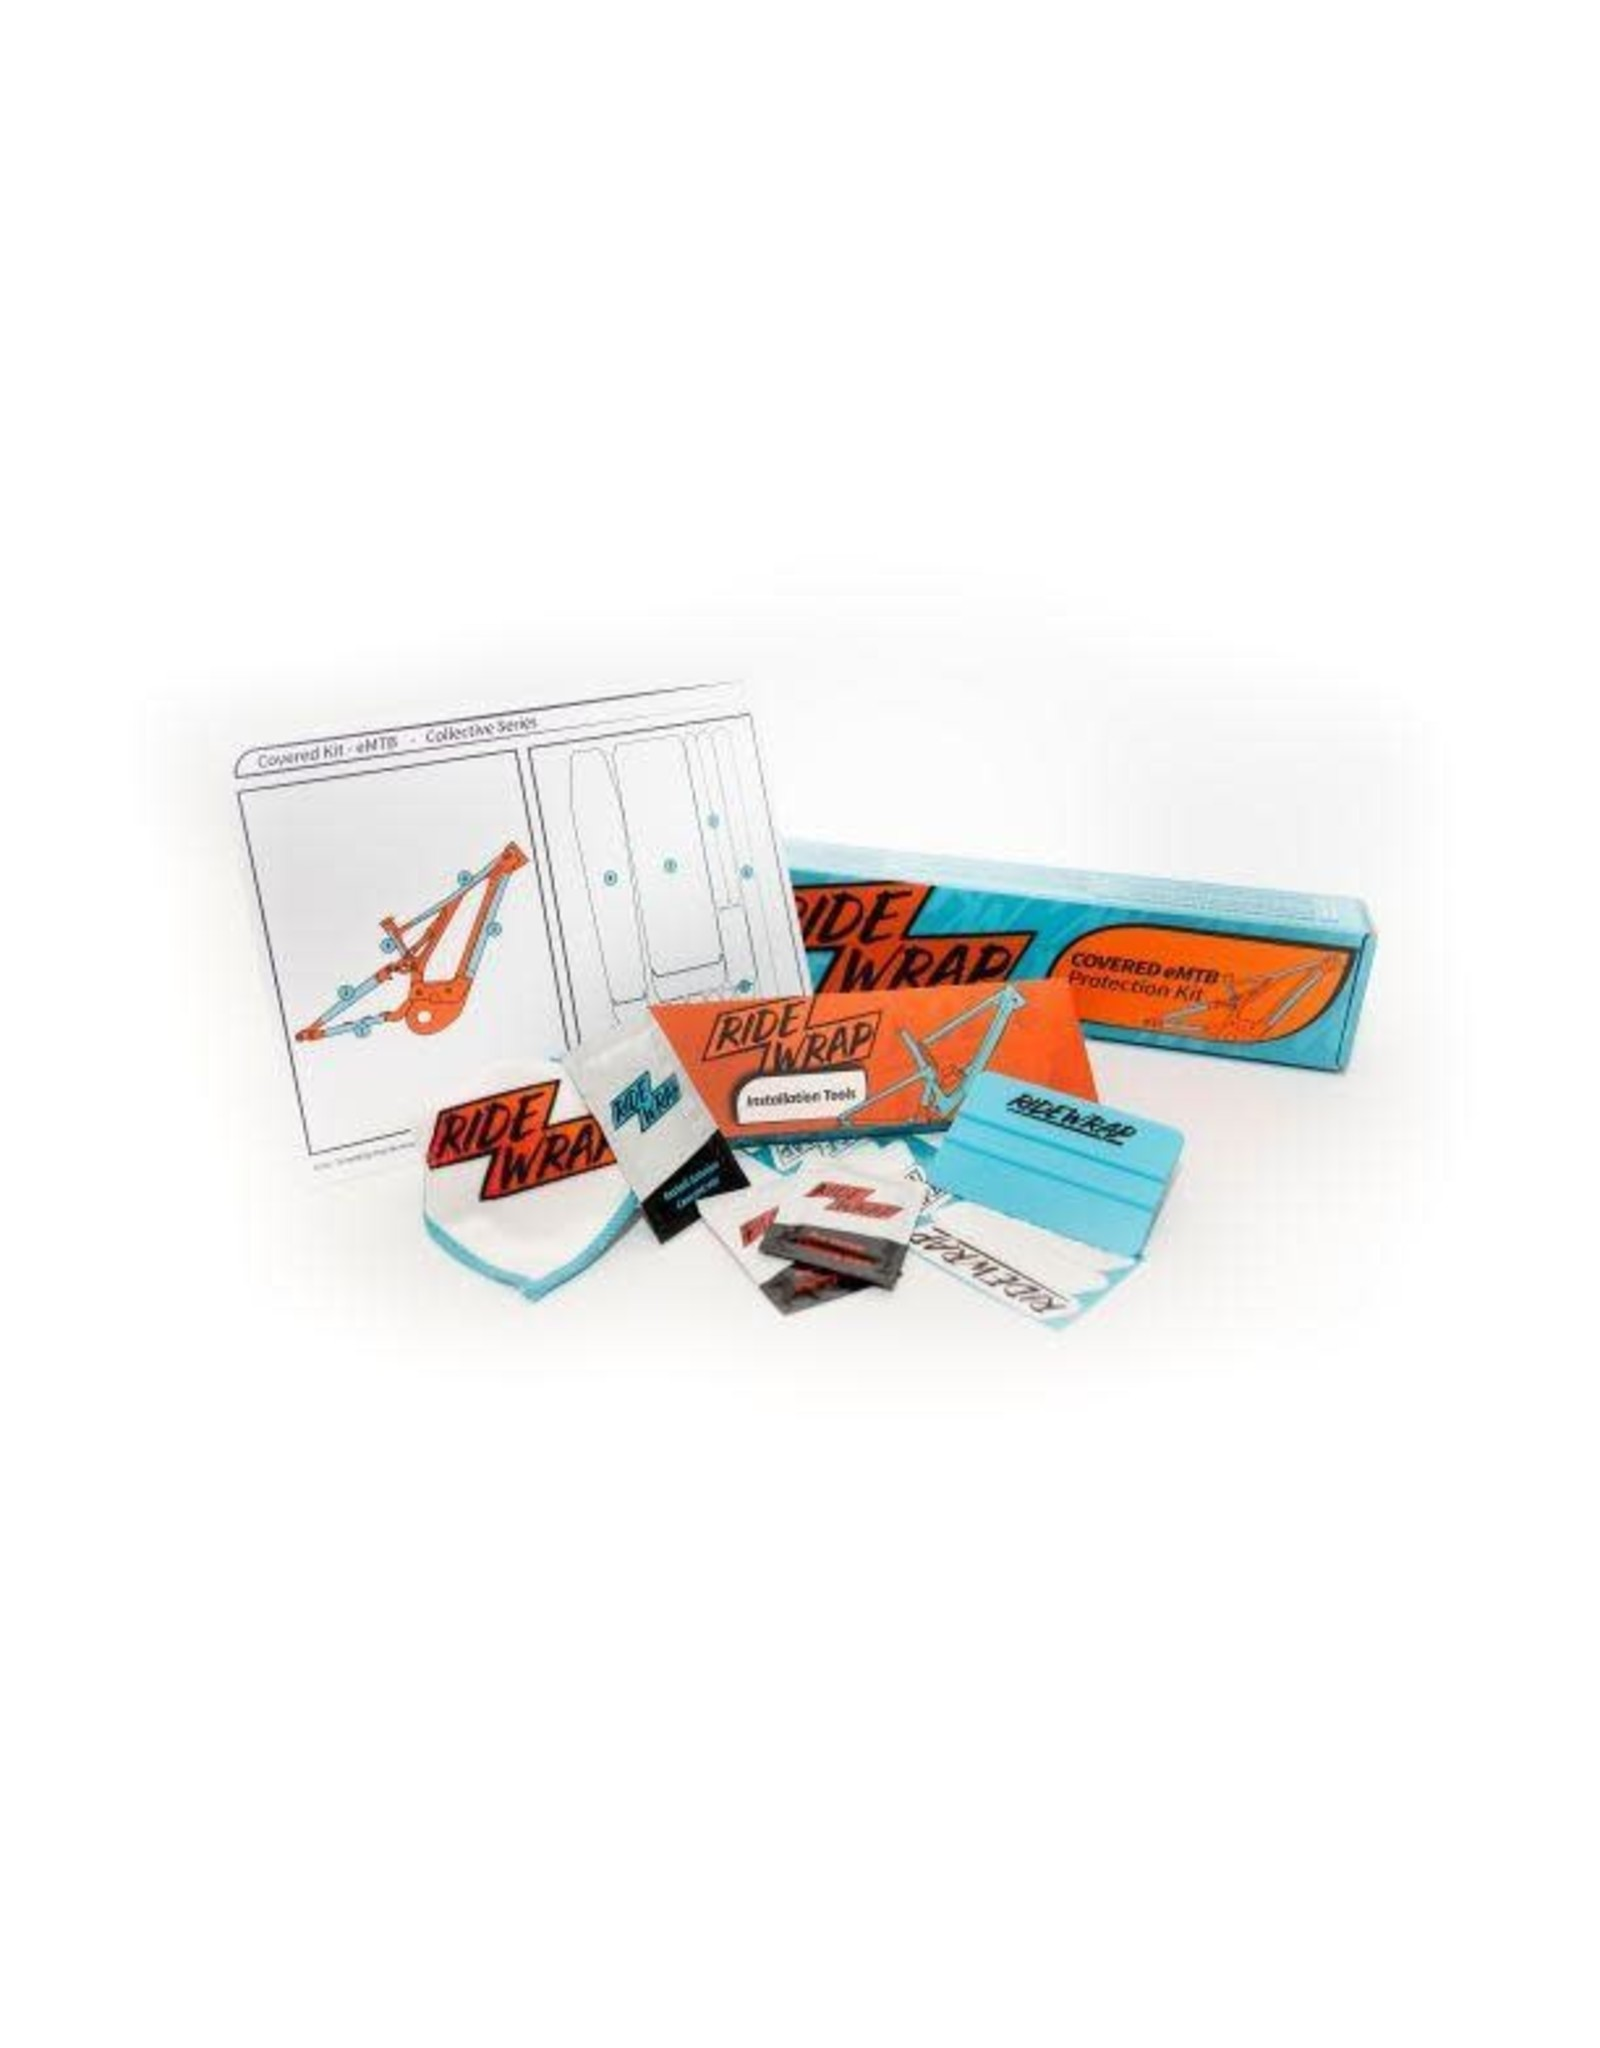 Ridewrap covered frame protection kit, E-bike, Gloss